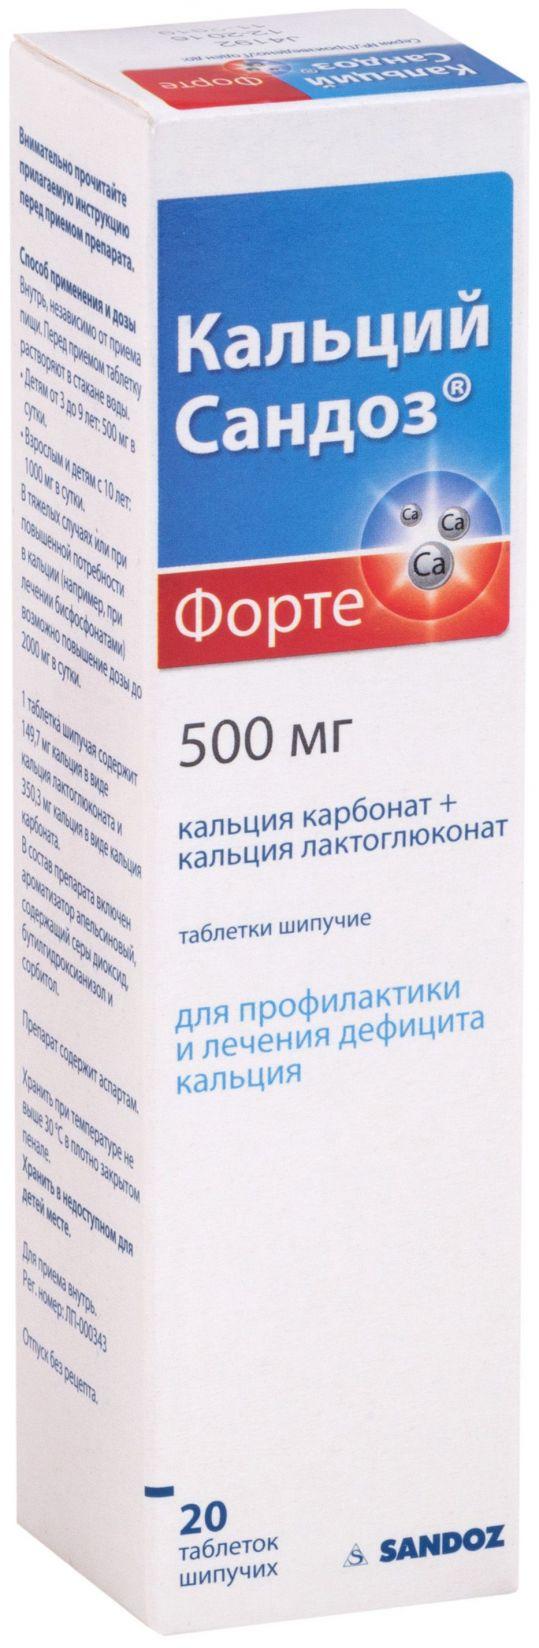 Кальций-сандоз форте 500мг 20 шт. таблетки шипучие, фото №1